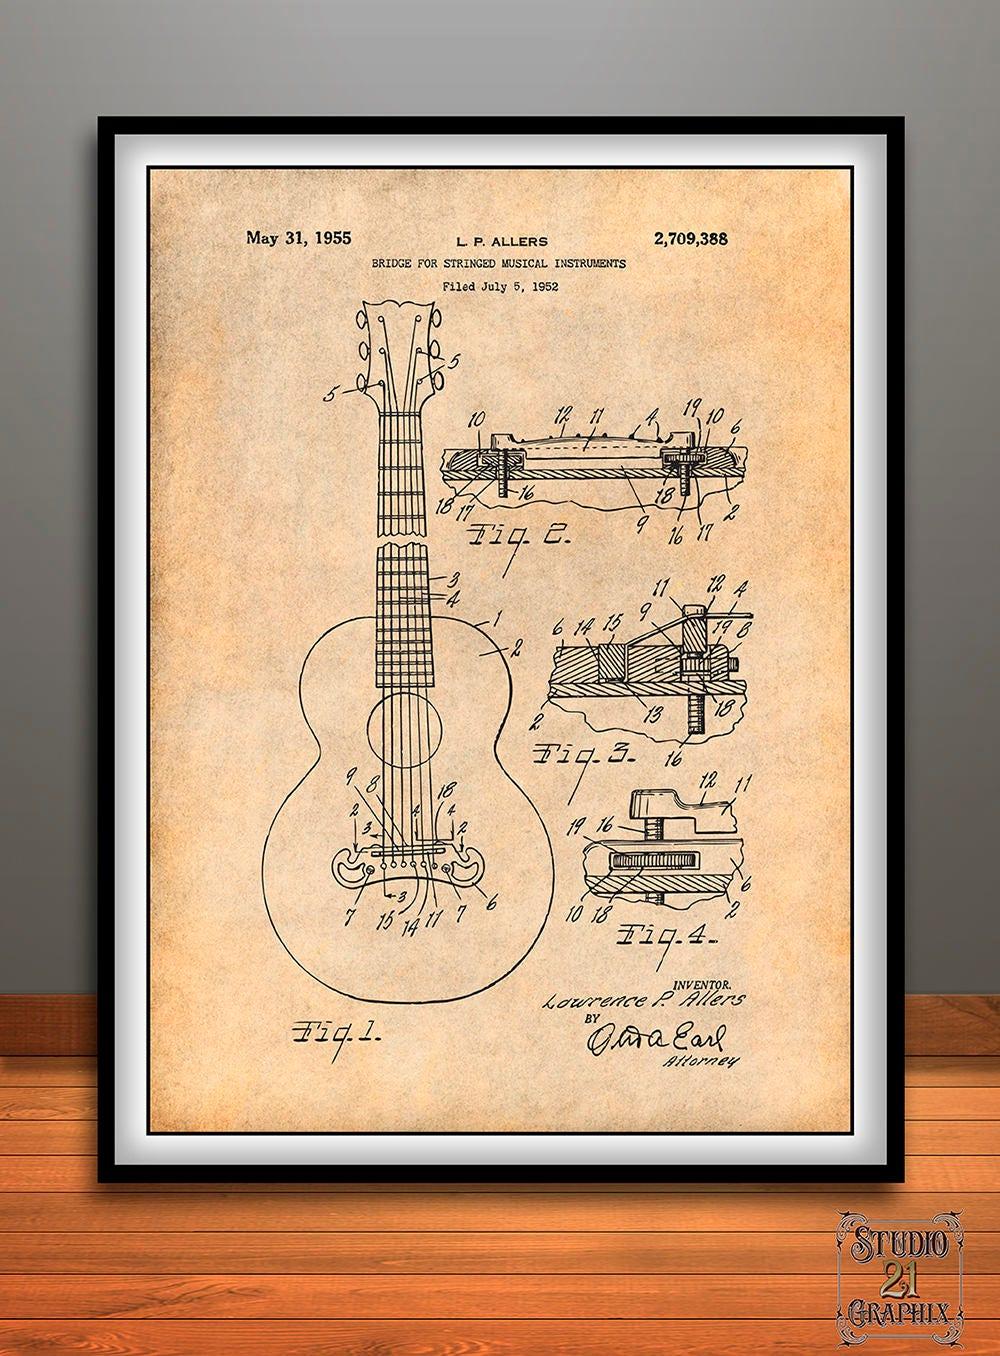 1952 Gibson Guitar Bridge Patent Print, Guitar Art, Guitar Player Gift,  Acoustic Guitar, Musician Gift, Music Room Decor, Guitarist Gift